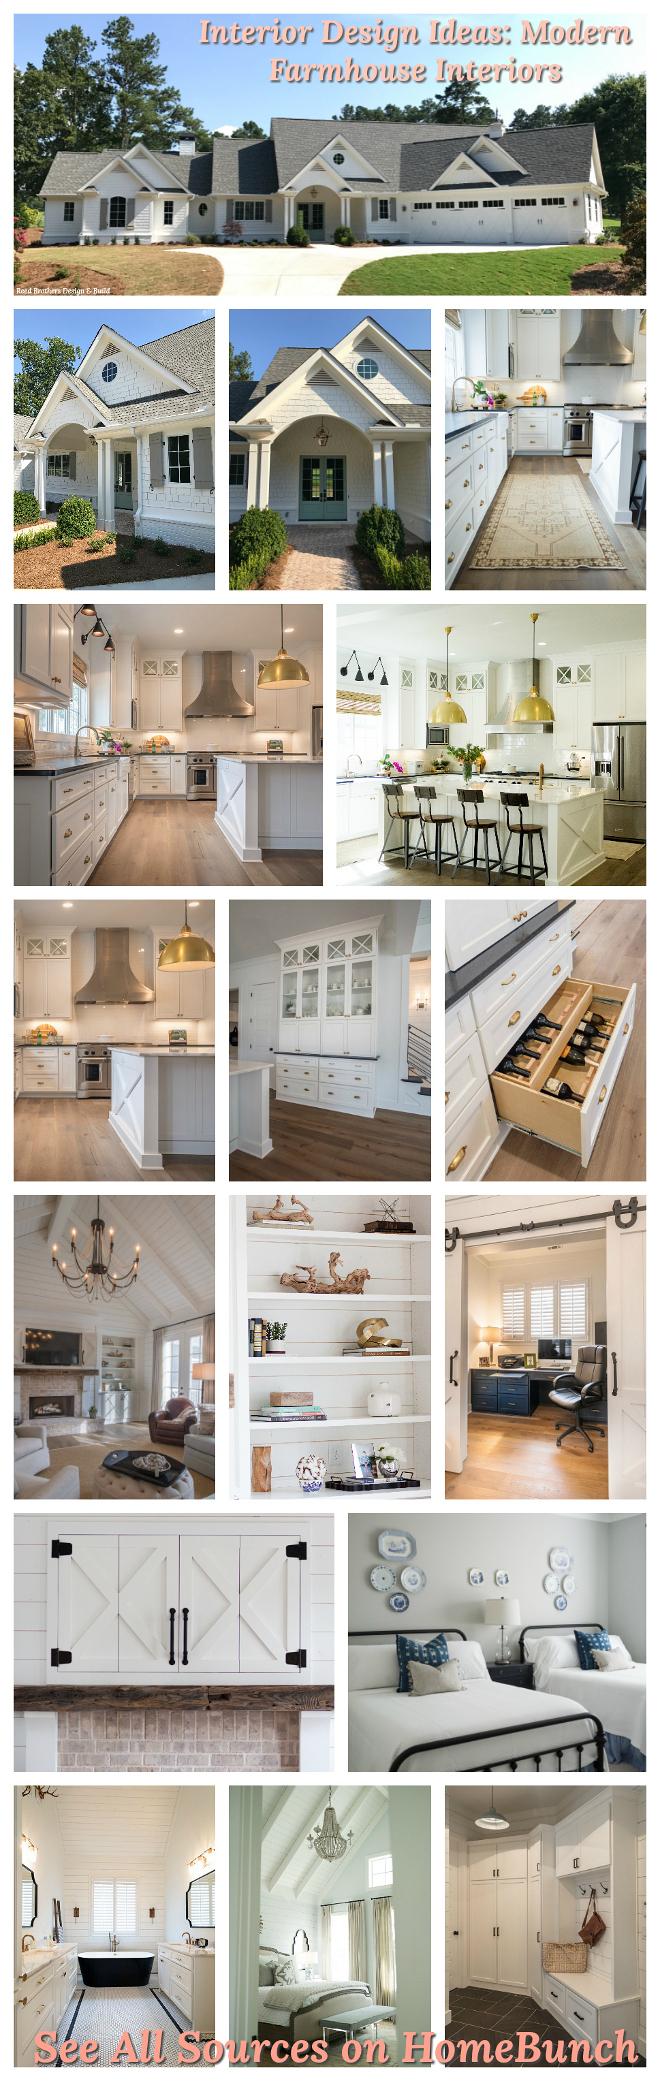 Inspiring Interior Color Scheme Home Bunch Interior Design